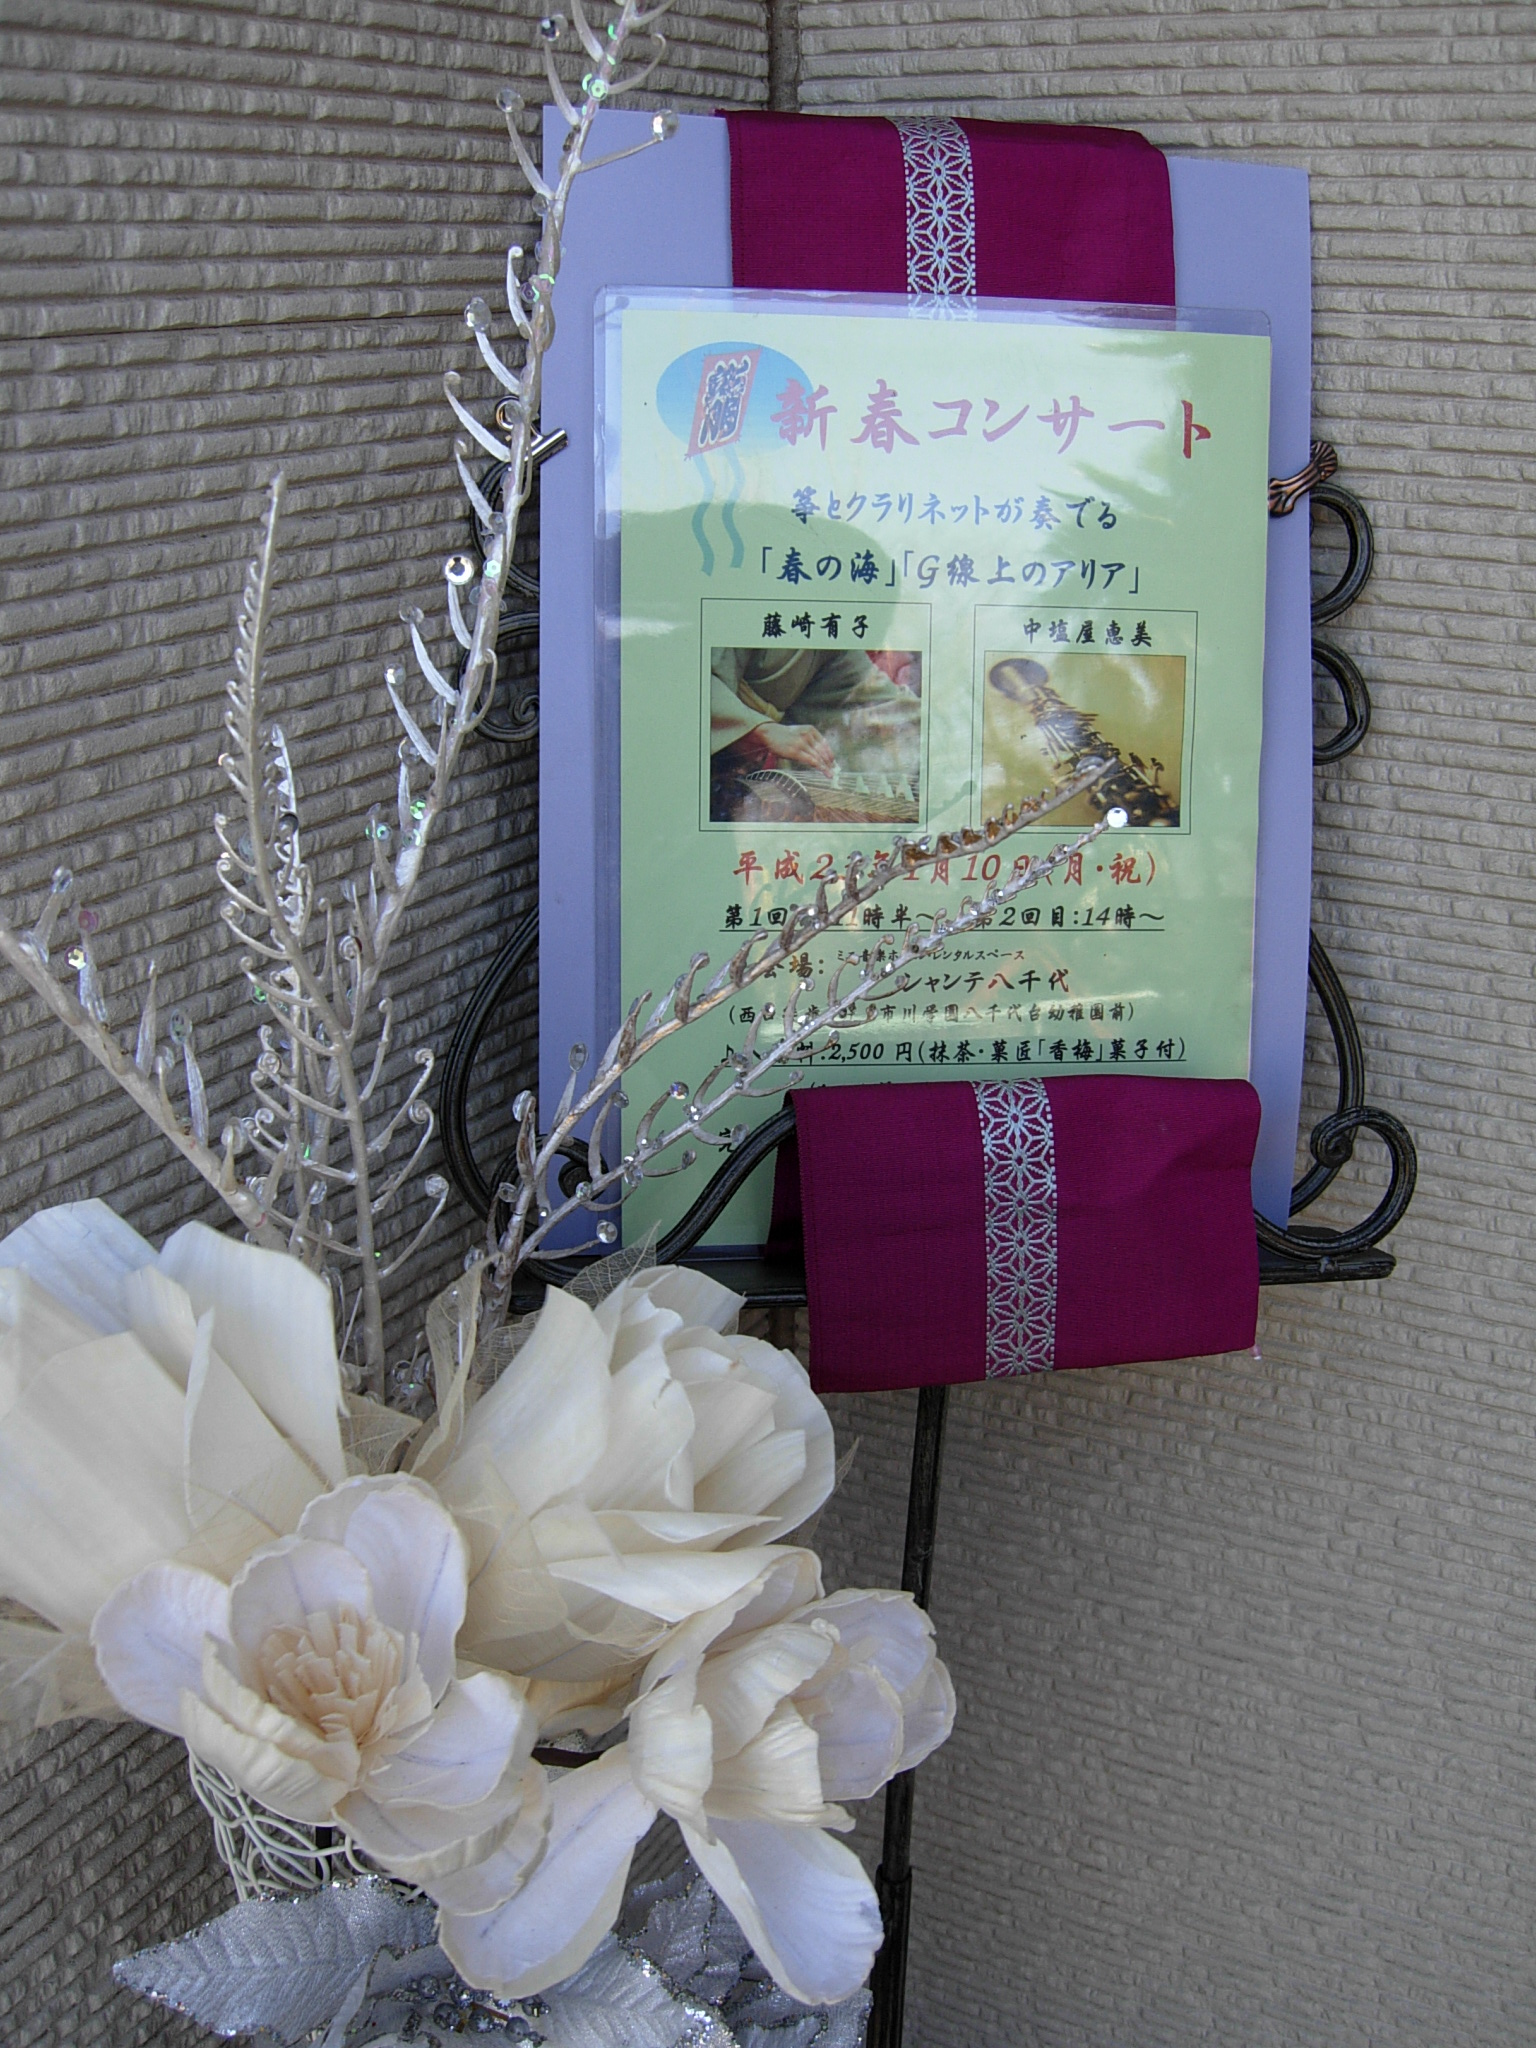 http://chanter-yachiyo.com/2011_0110_114520-DSCN1382.JPG